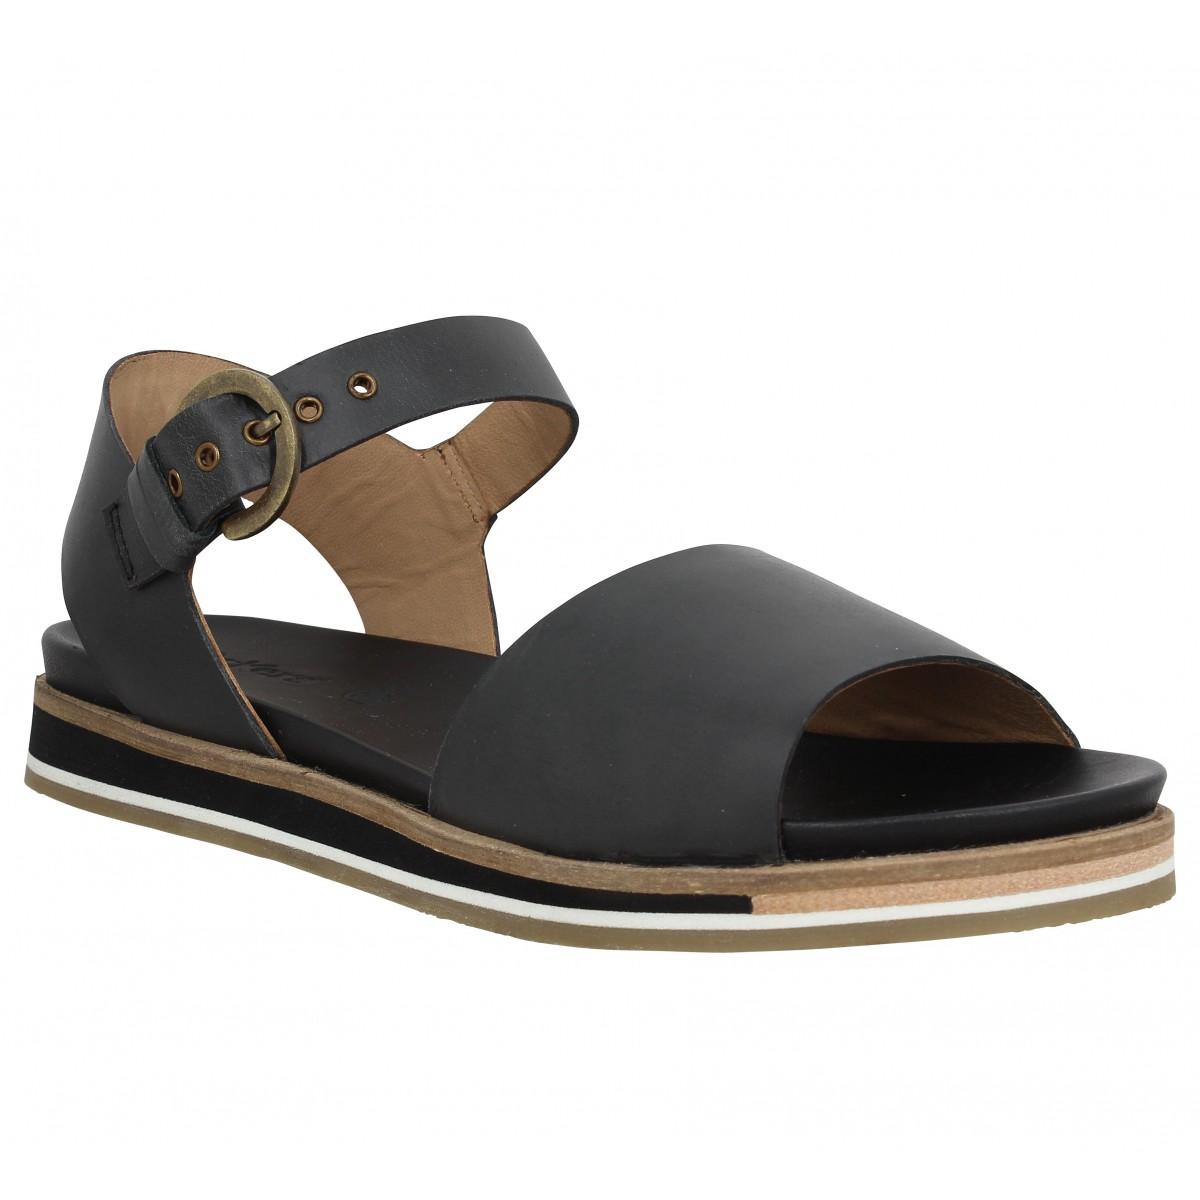 Kickers Sandales cuir OLIMPI Jeu Abordable Nouveau Style gZD0dd